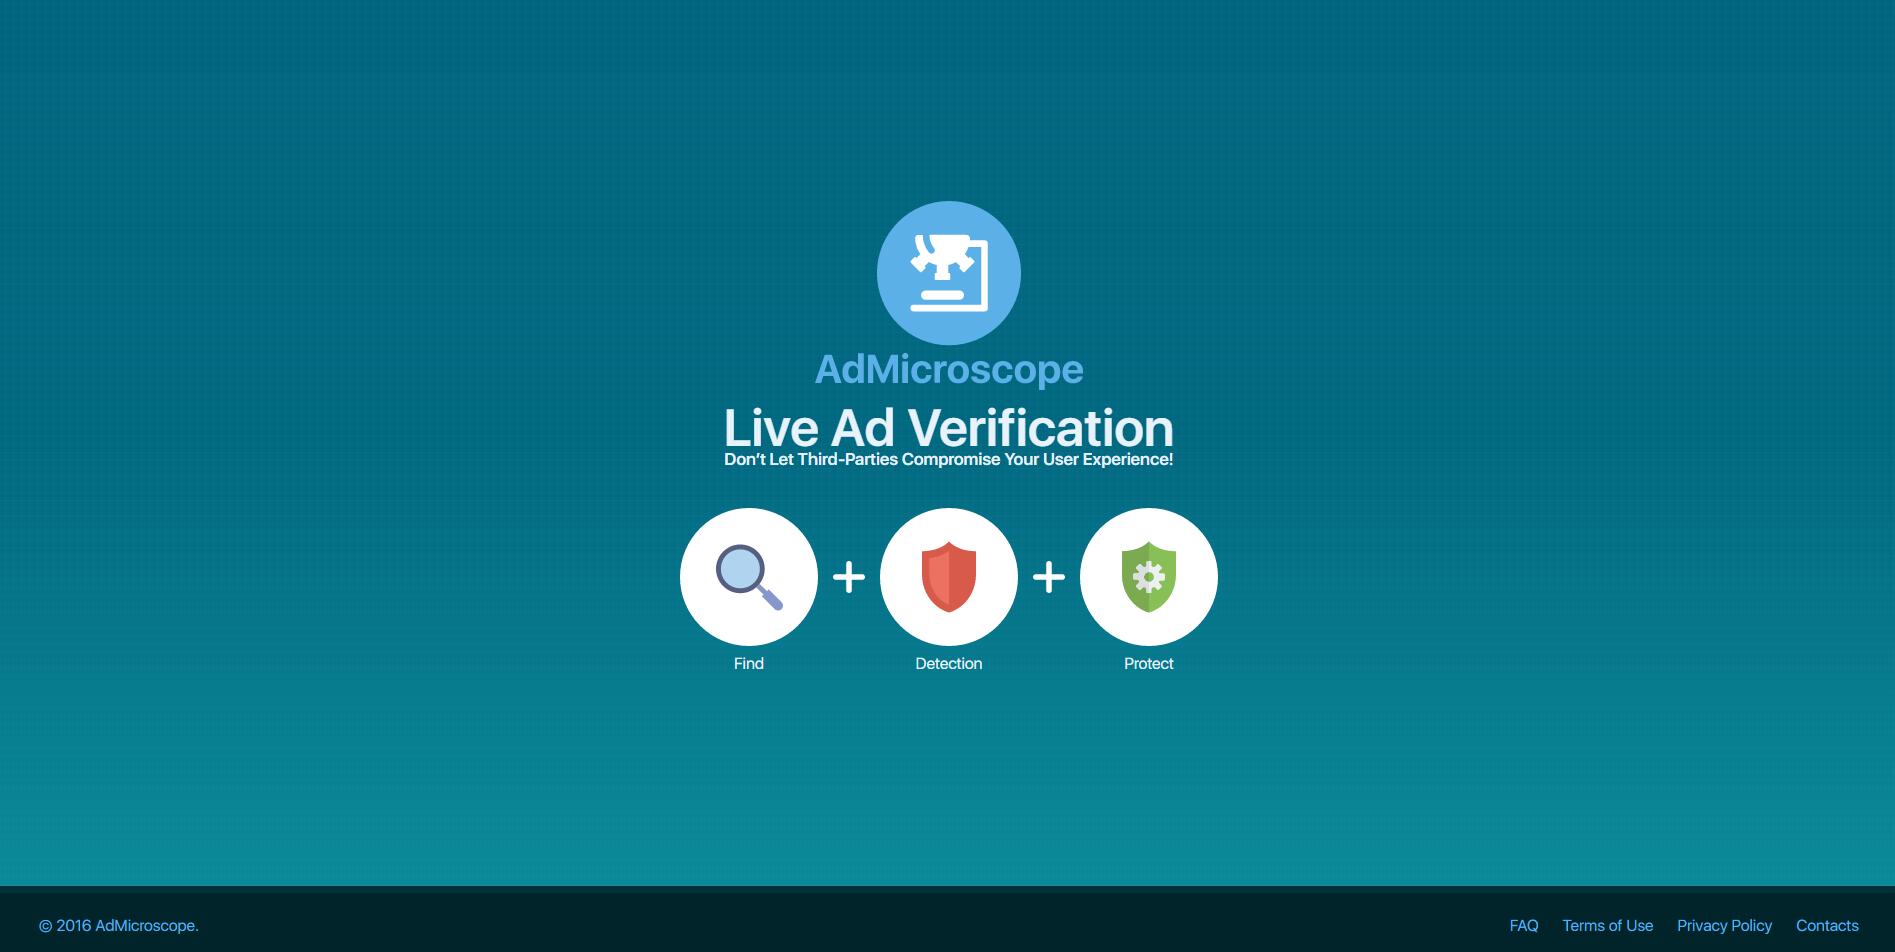 AdMicroscope Ads